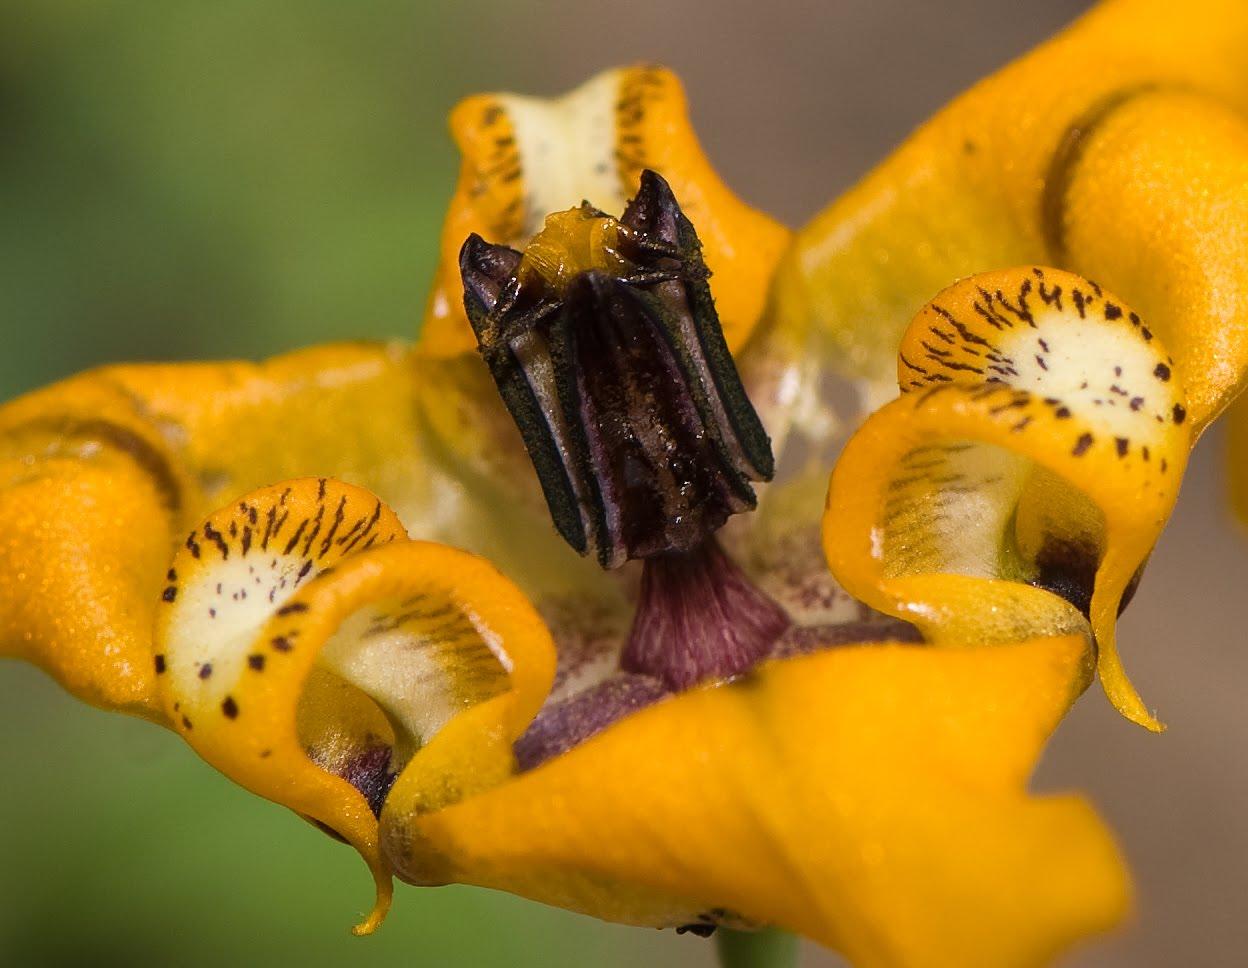 Imagenes De Flores Exsoticas - exóticas flores, orientales Descargar Fotos gratis Freepik